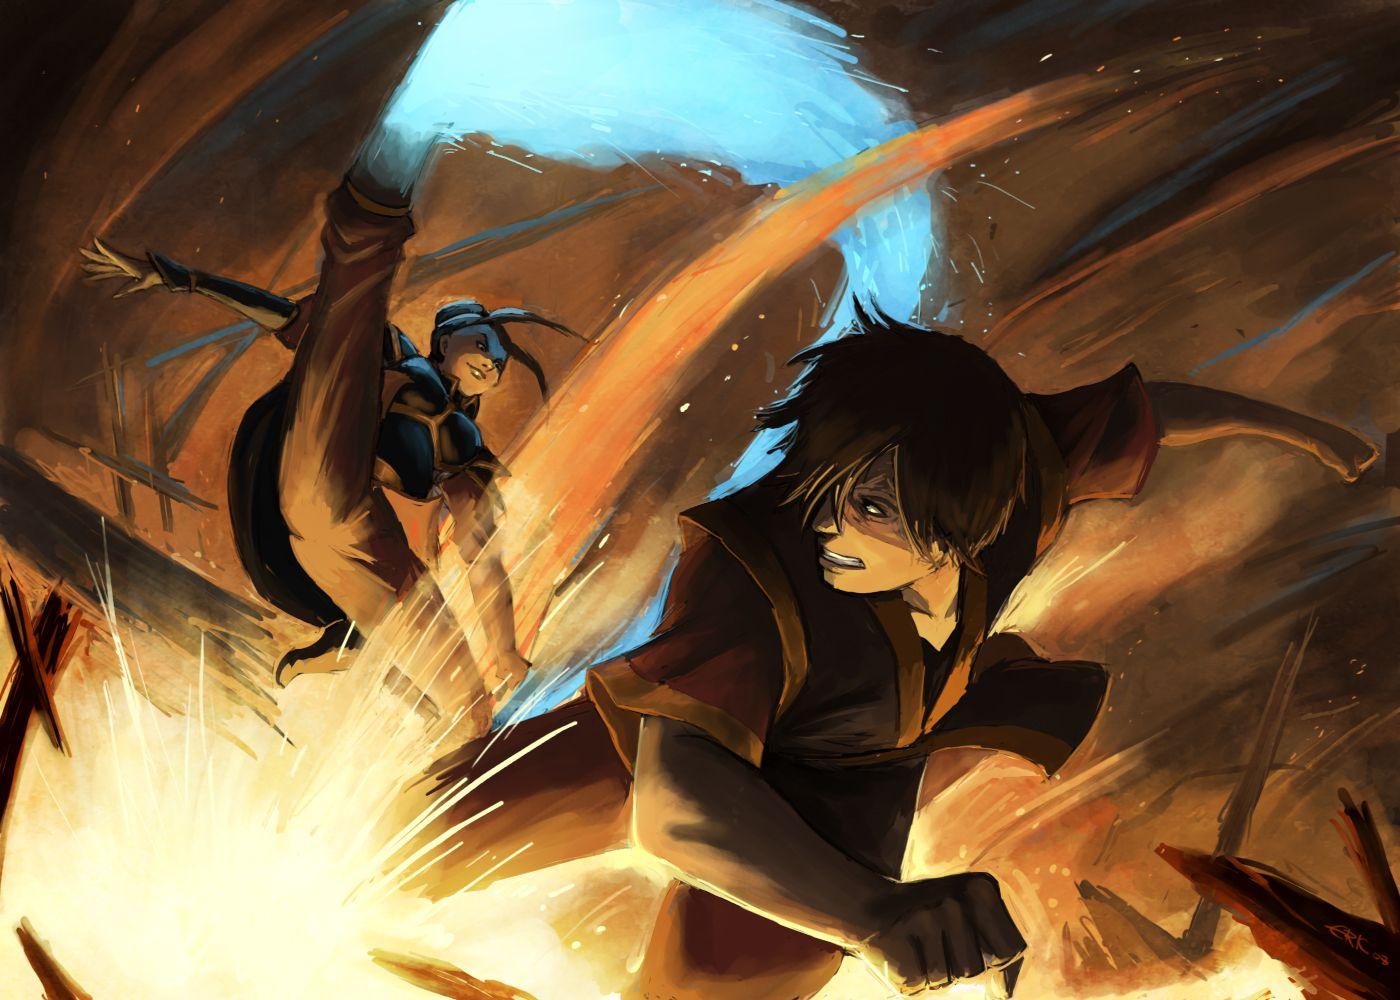 Azula vs. Zuko. Thank the heavens above for ATLA (sans